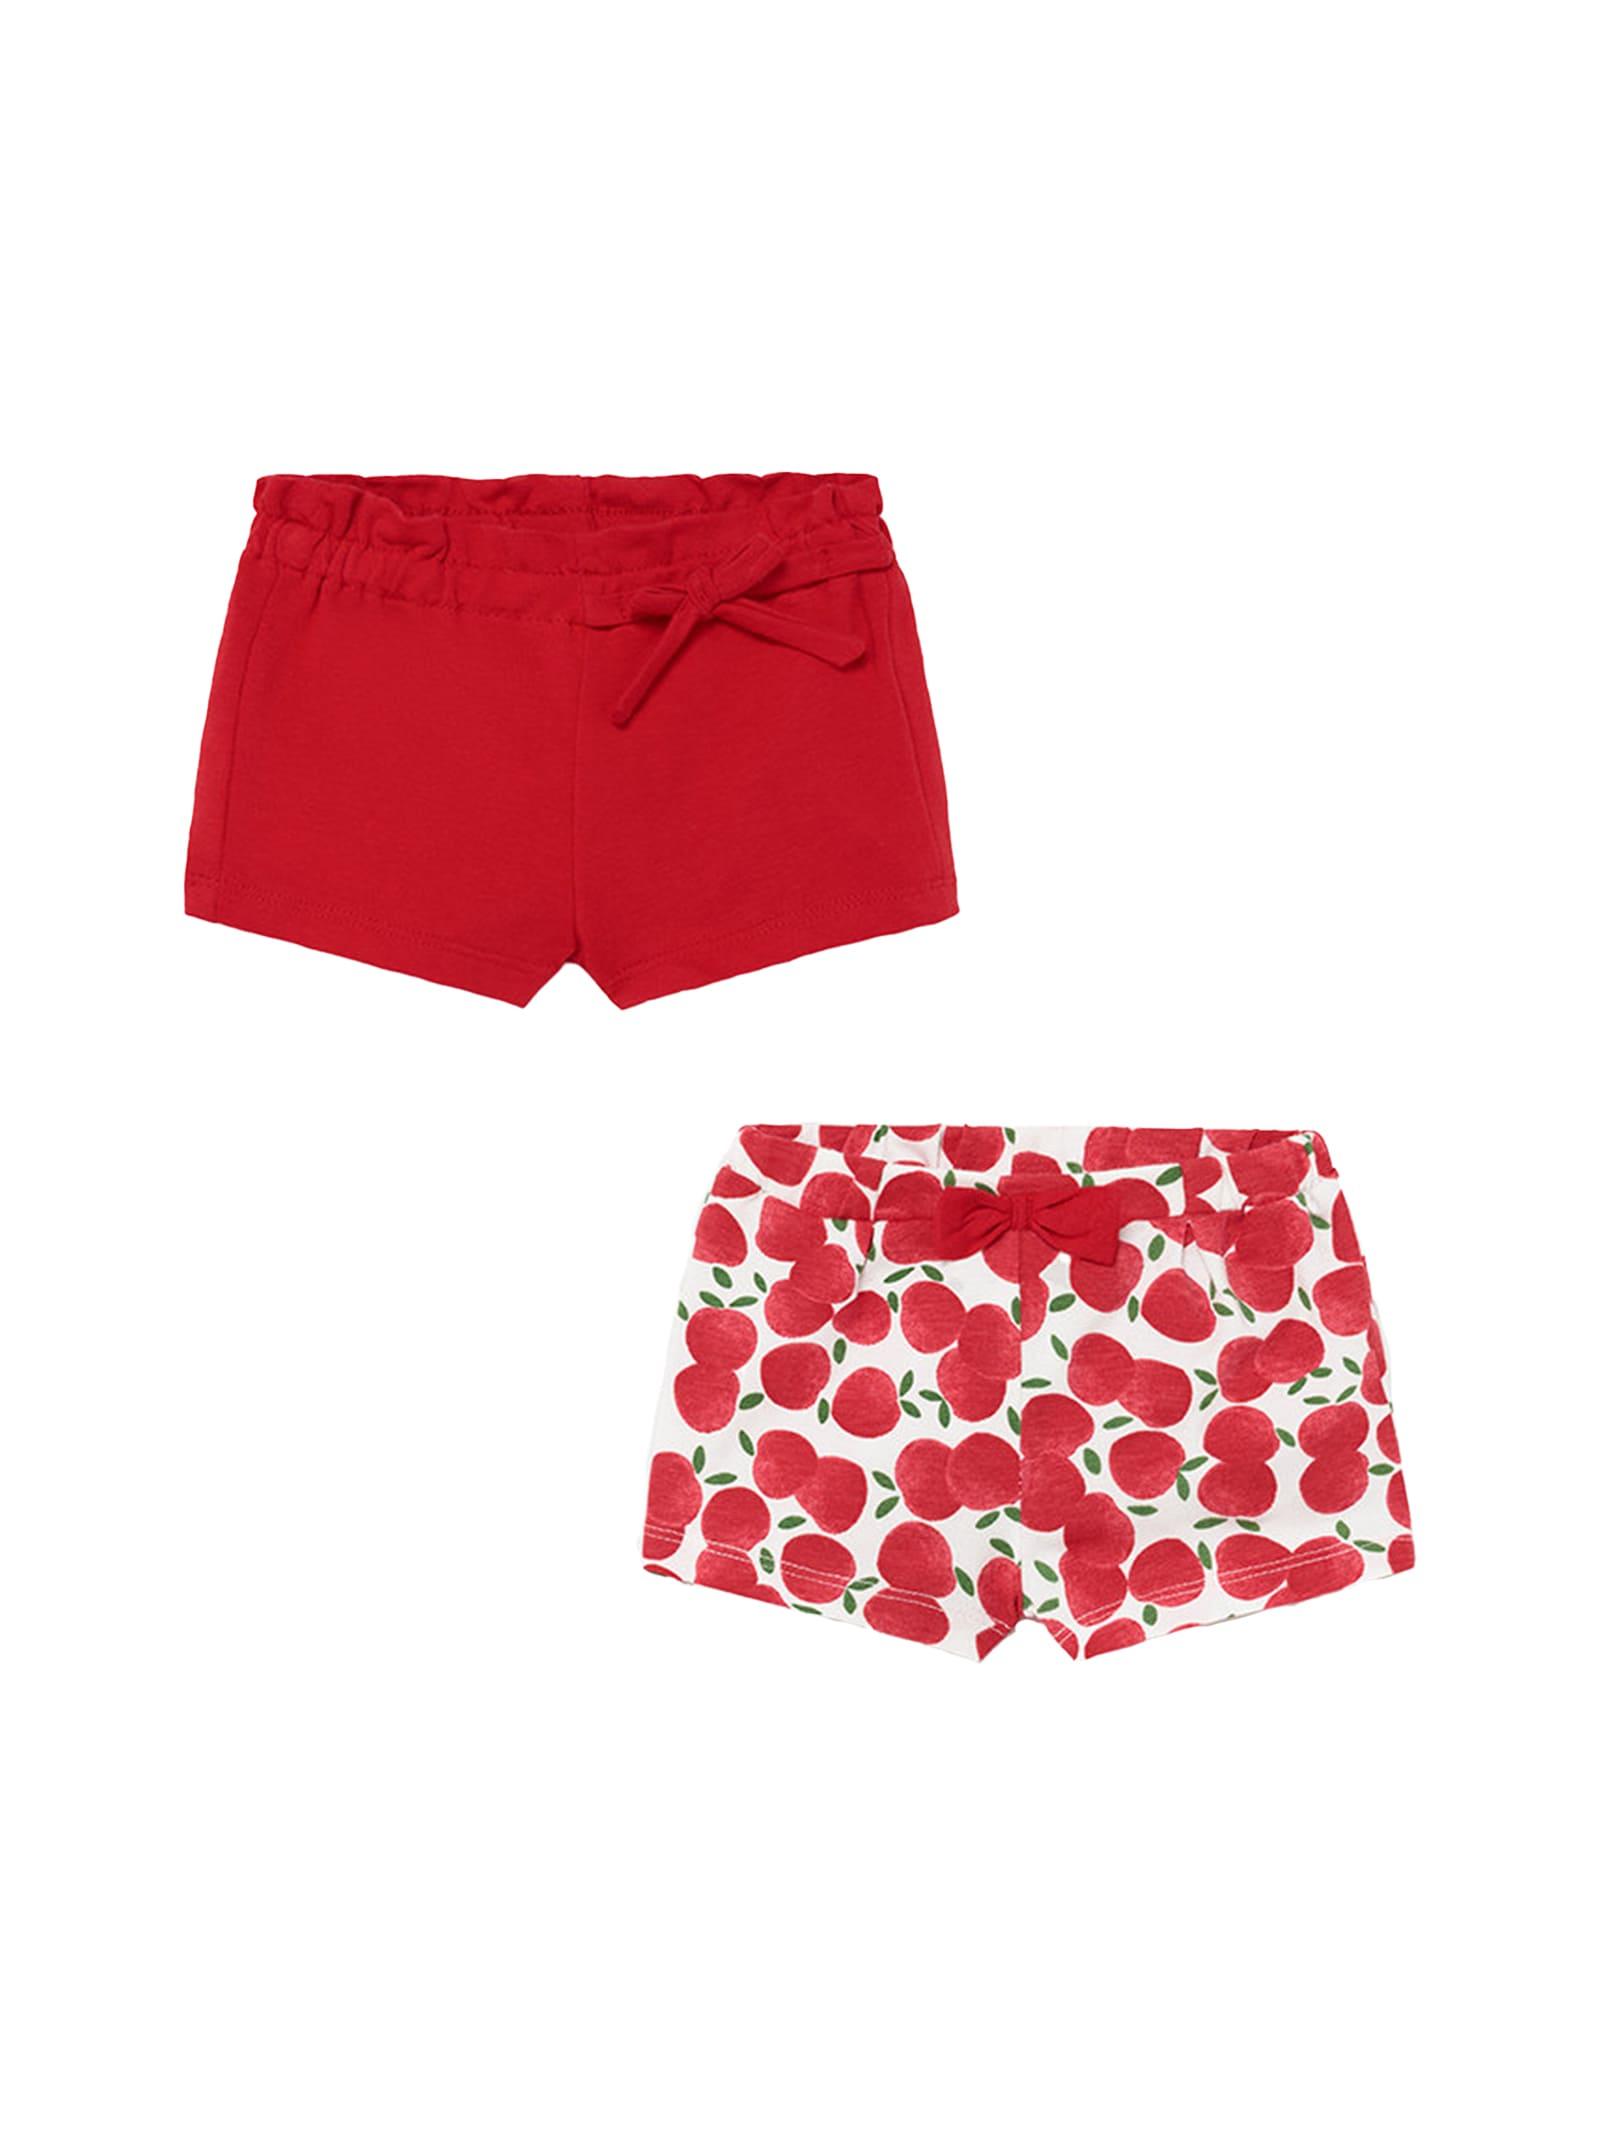 Coppia di Shorts Red MAYORAL NEWBORN | Shorts | 1206054